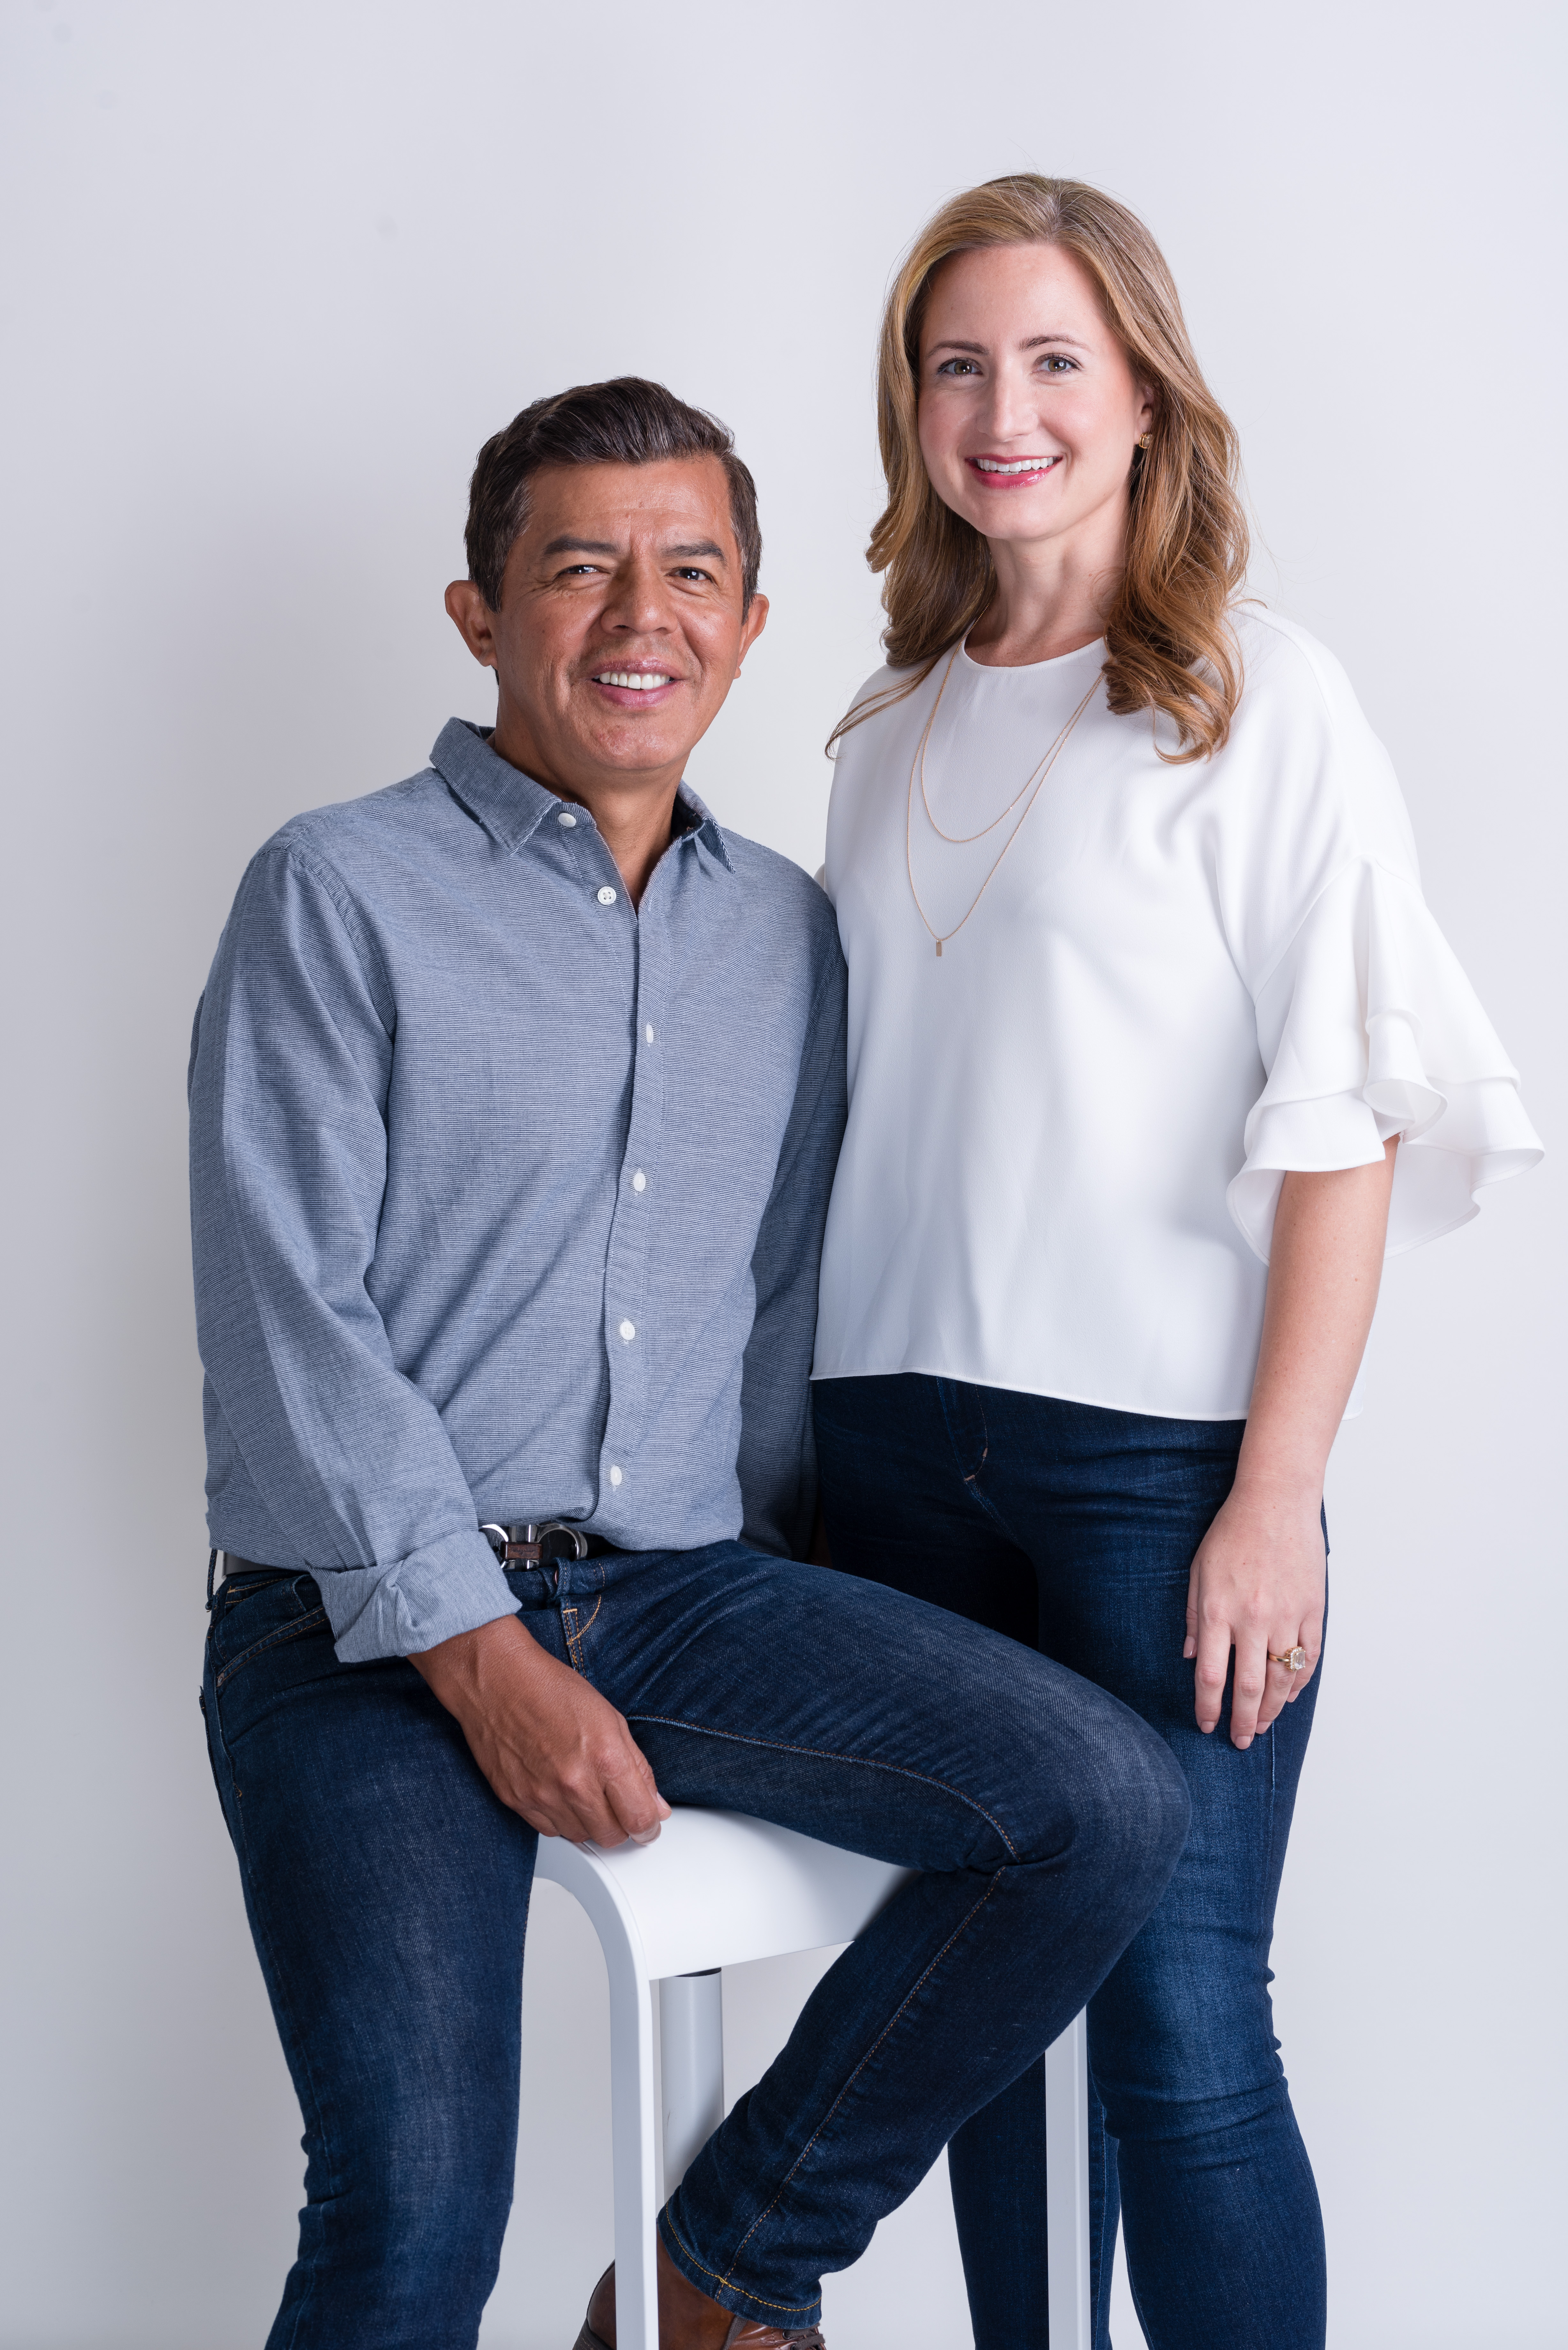 Fabian Lliguin y Anna Ayers - Rahua - Beauty Innovators - Abril 2019